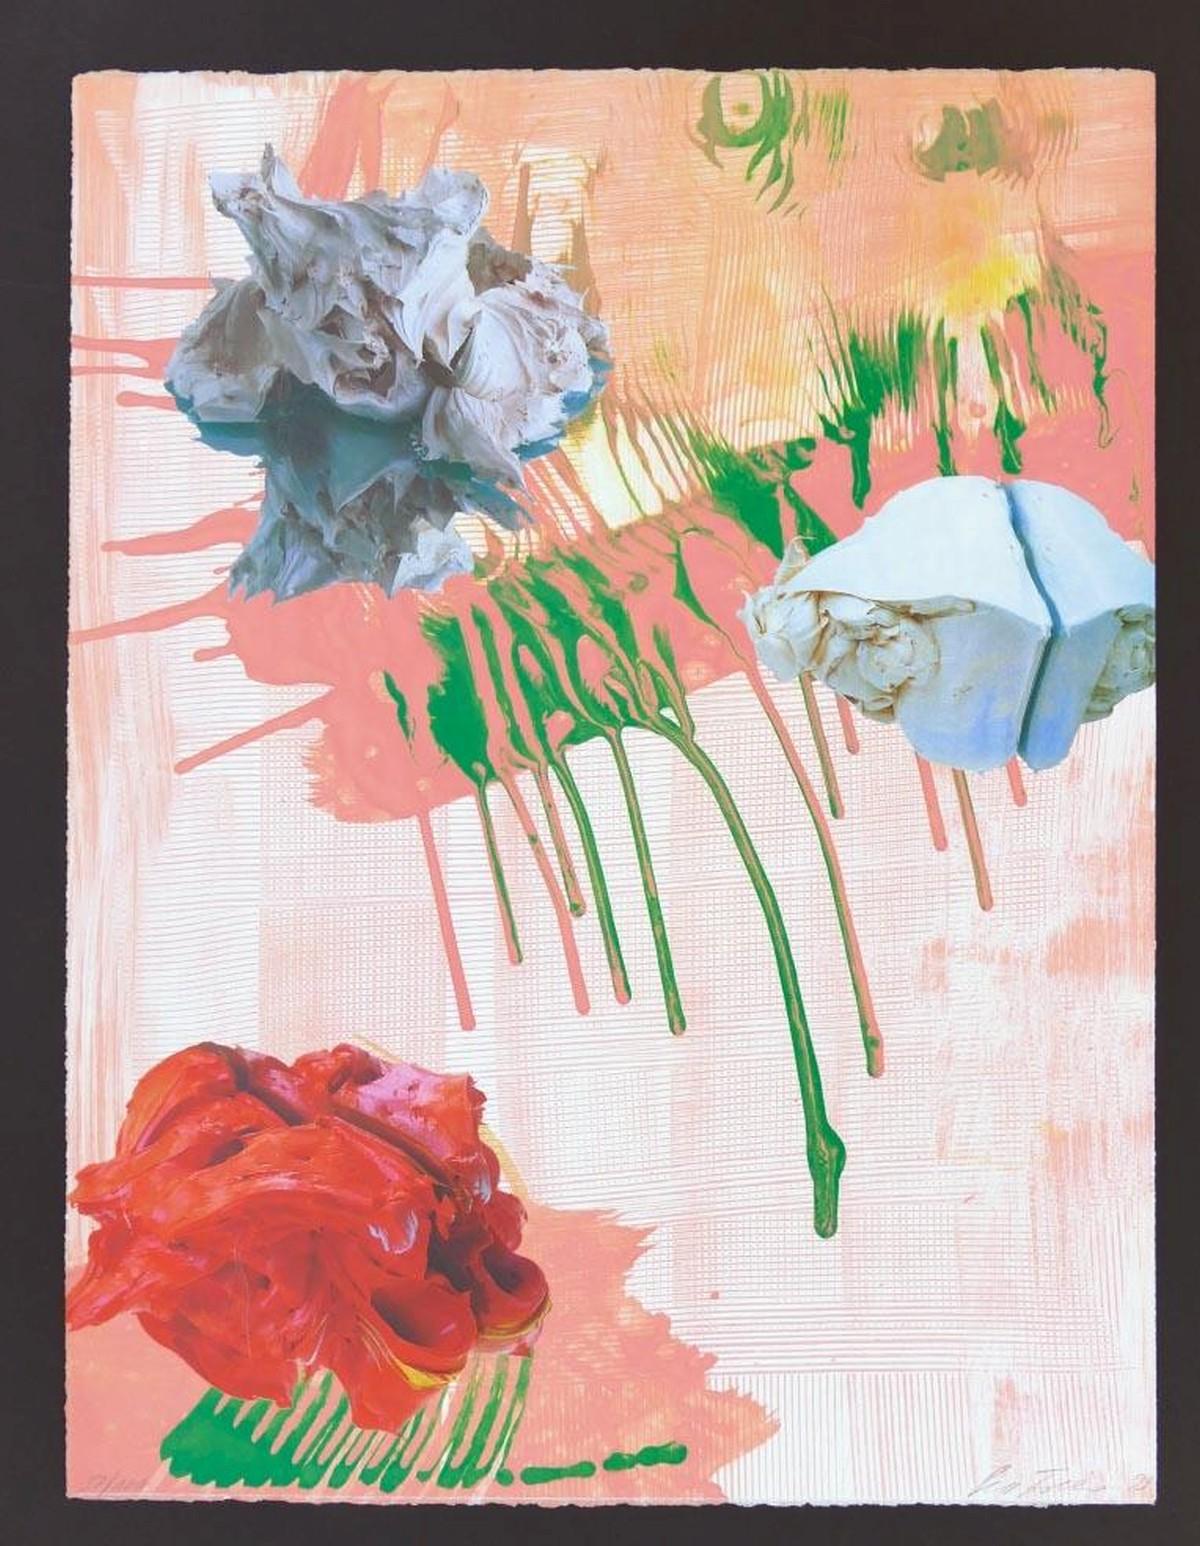 Pia Fries - o.T., Original Farbsiebdruck, signiert, num., dat. kopen? Bied vanaf 590!